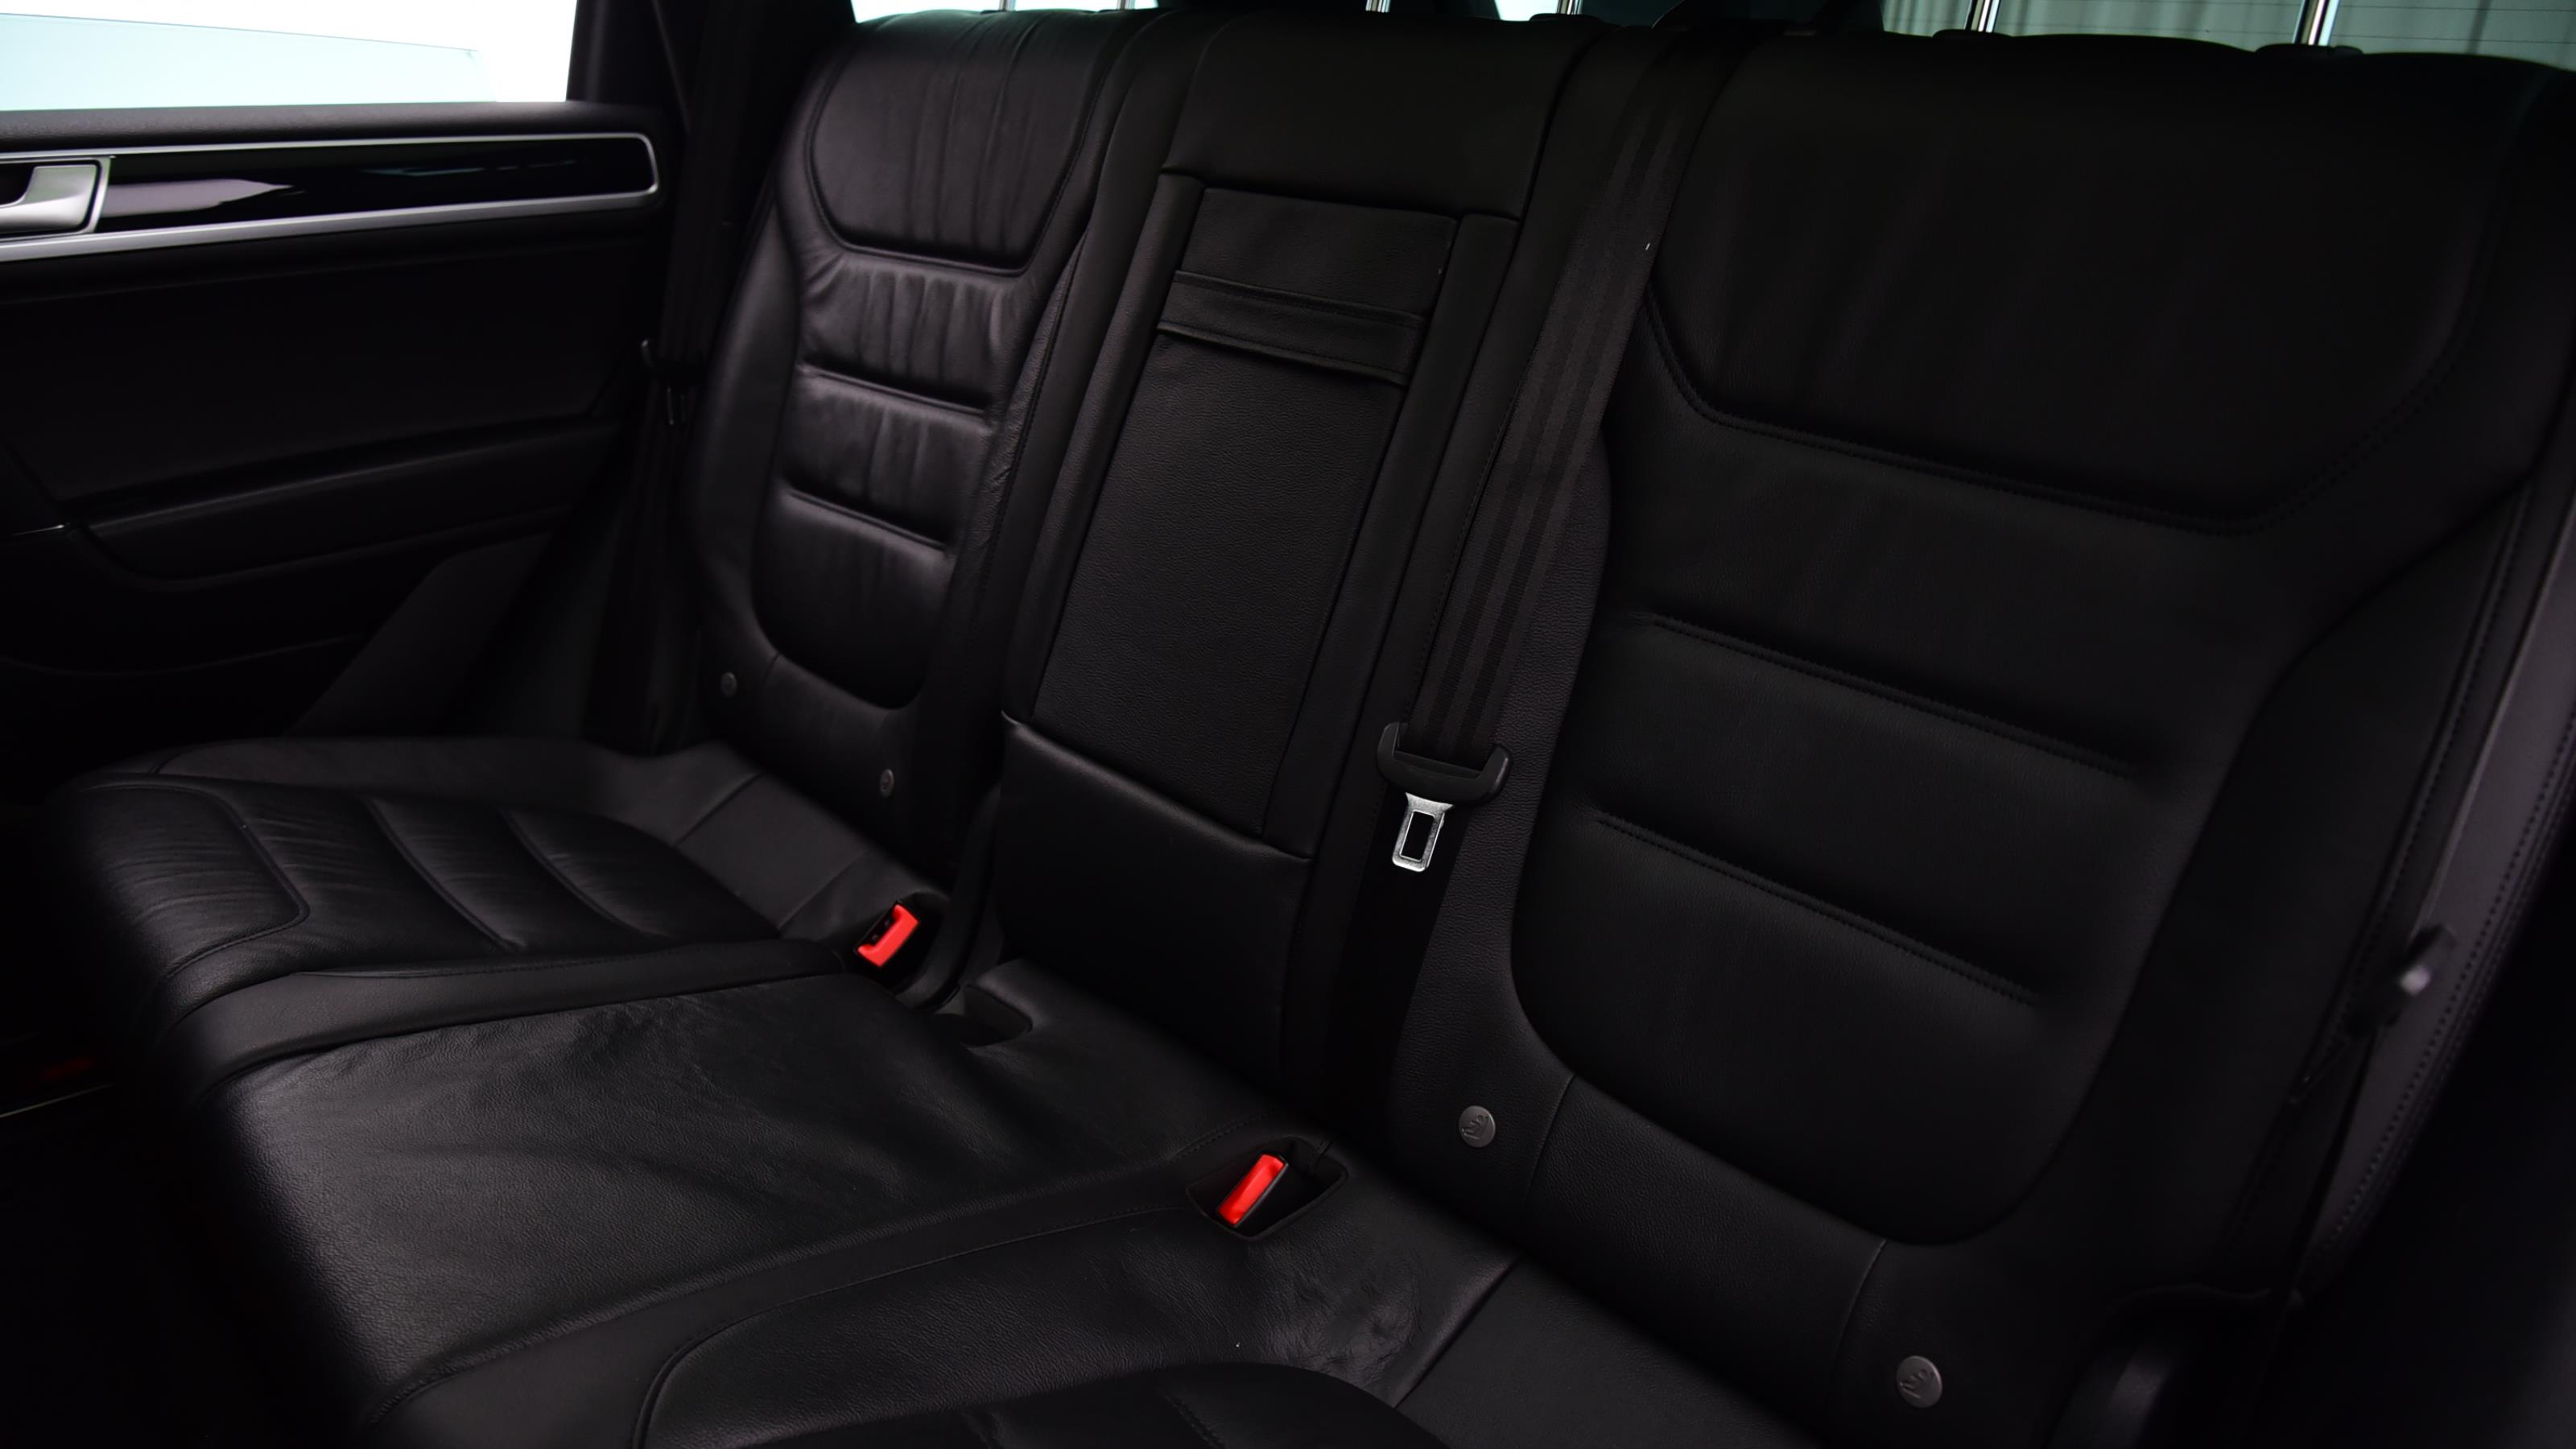 Used 2016 Volkswagen TOUAREG 3.0 V6 TDI BMT 262 R Line Plus 5dr Tip Auto WHITE at Saxton4x4